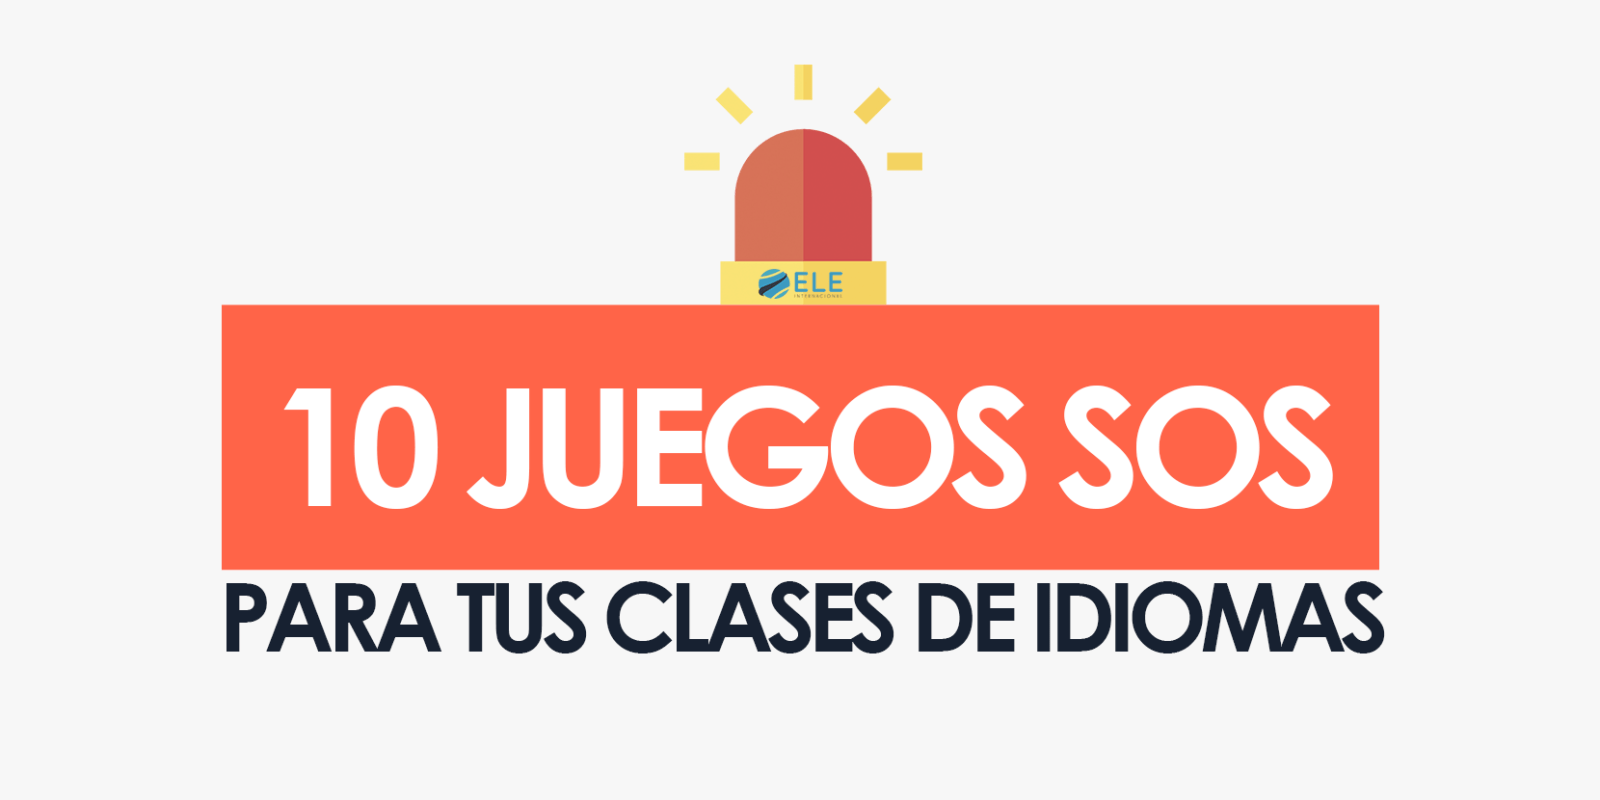 Juegos para clase de idiomas. Juegos para clase de ELE. Gamificar en clase de idiomas. Actividades fáciles y rápidas #spanishteacher #profedeele #teachmorespanish